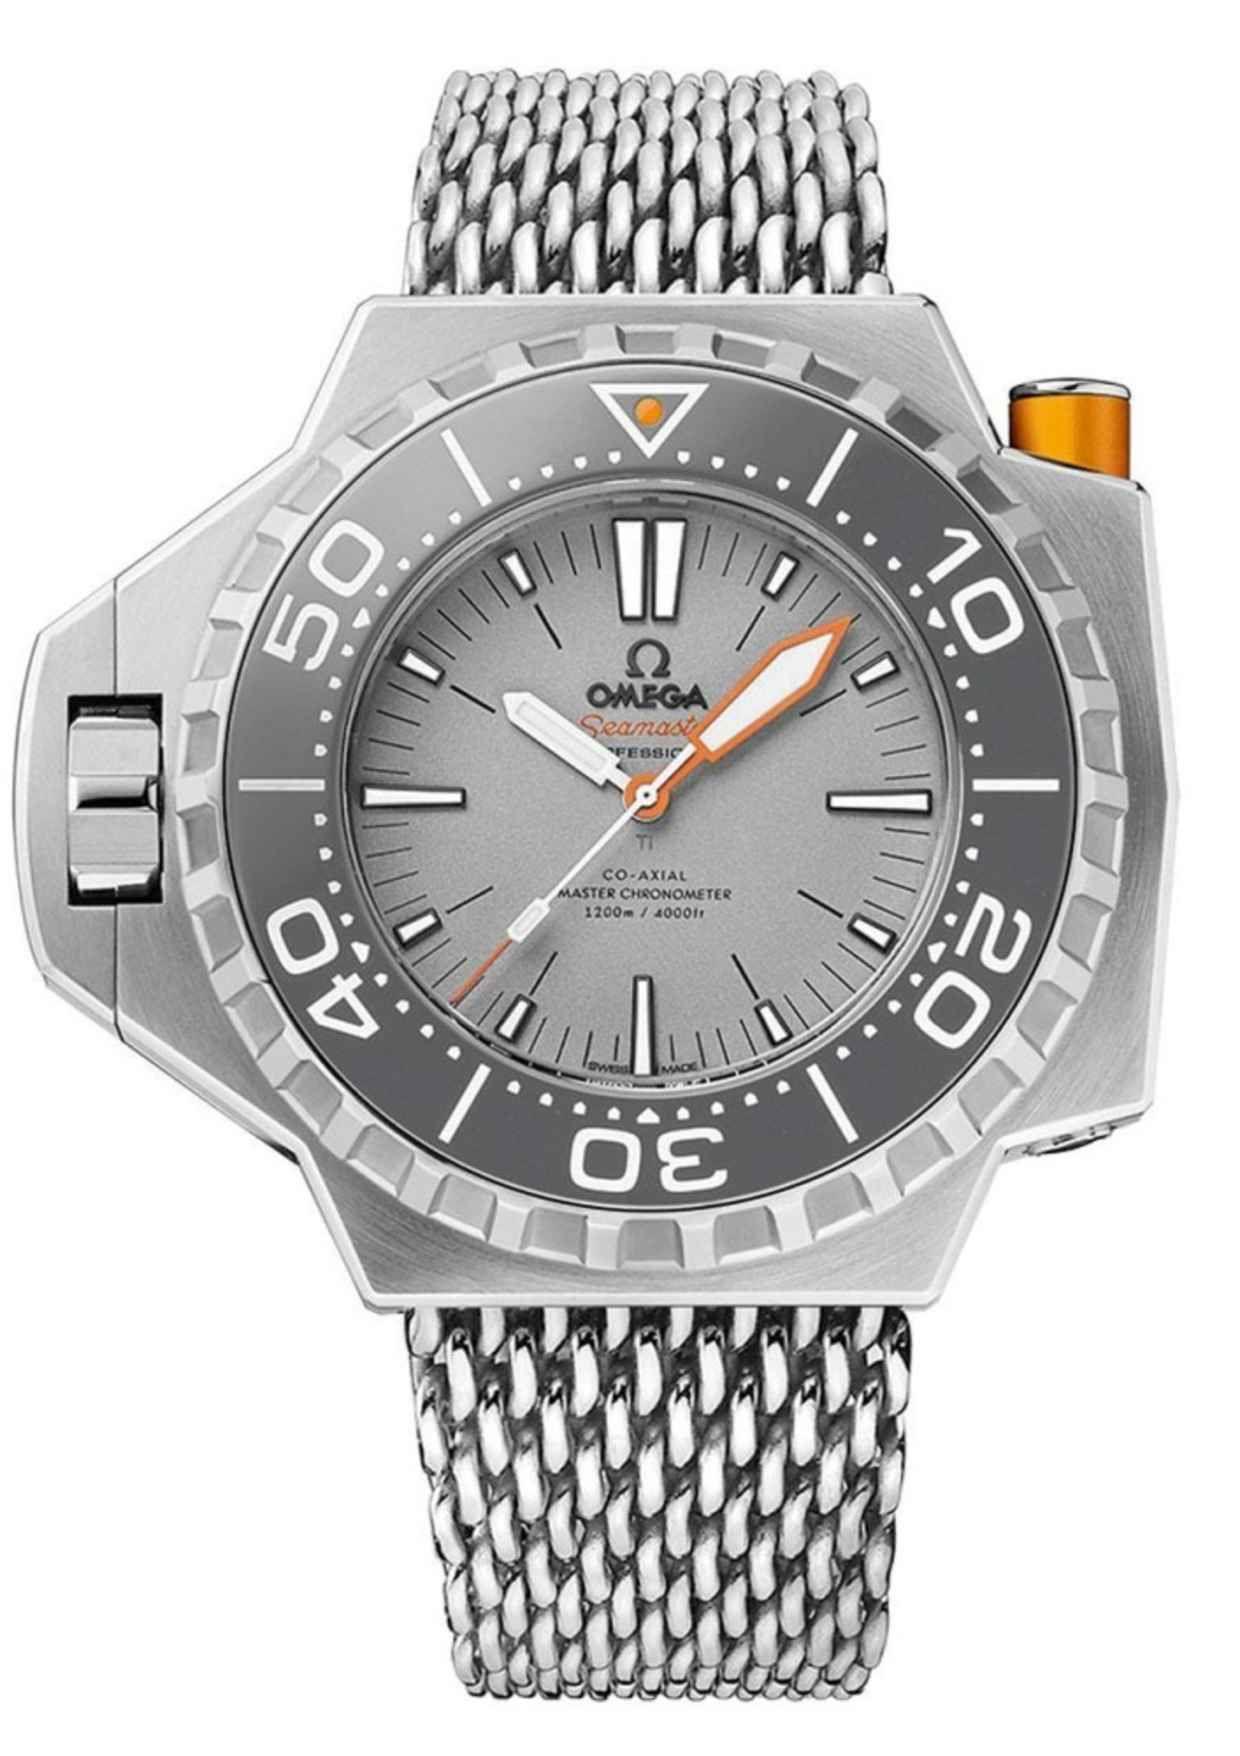 f02b8ccd807 Omega updates its PloProf Diver with a new titanium model